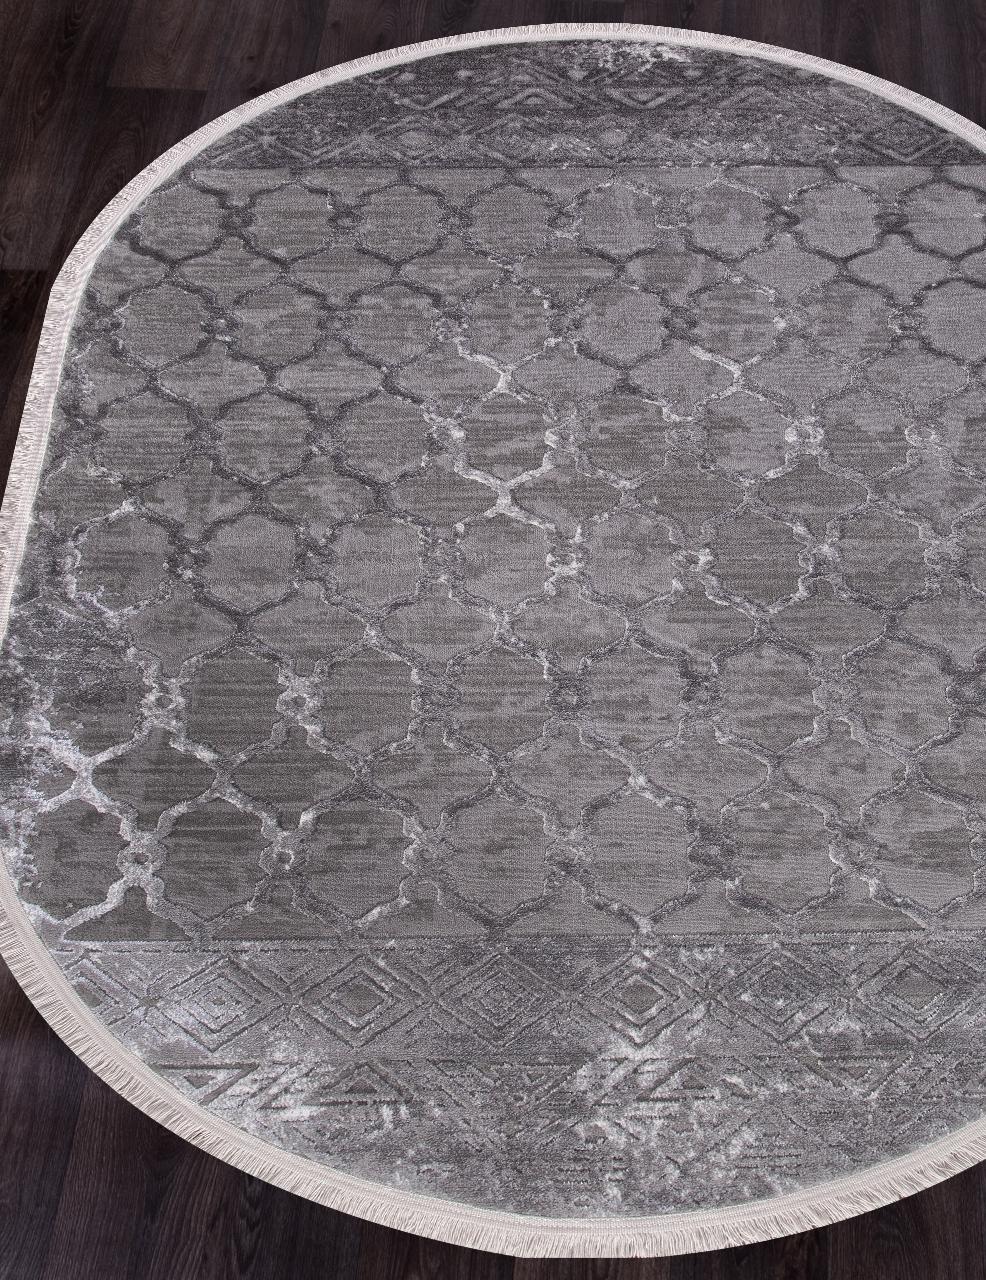 Ковер NP 224 - GREY - Овал - коллекция MOROCCO - фото 1